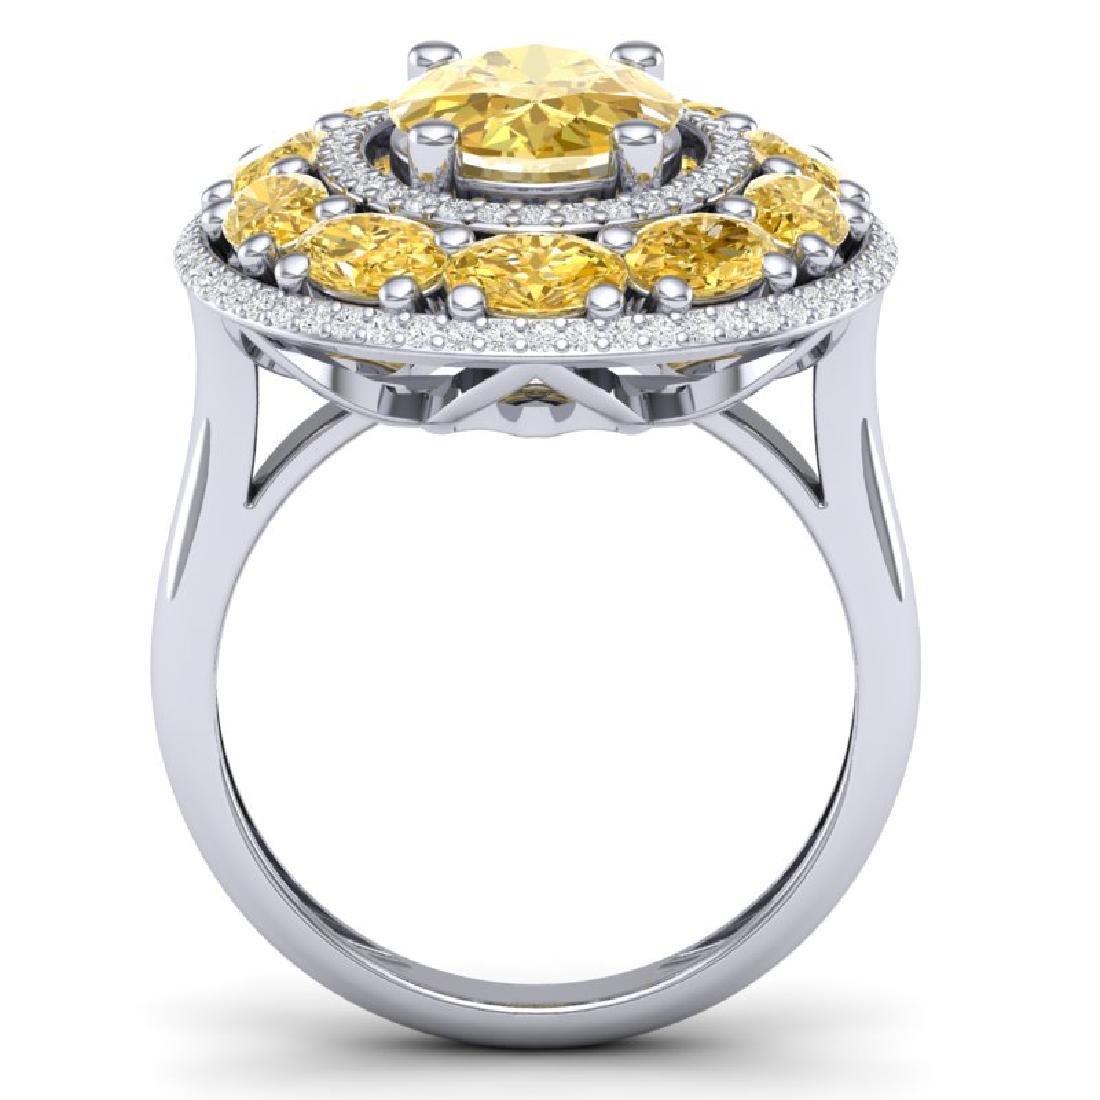 7.21 CTW Royalty Canary Citrine & VS Diamond Ring 18K - 3